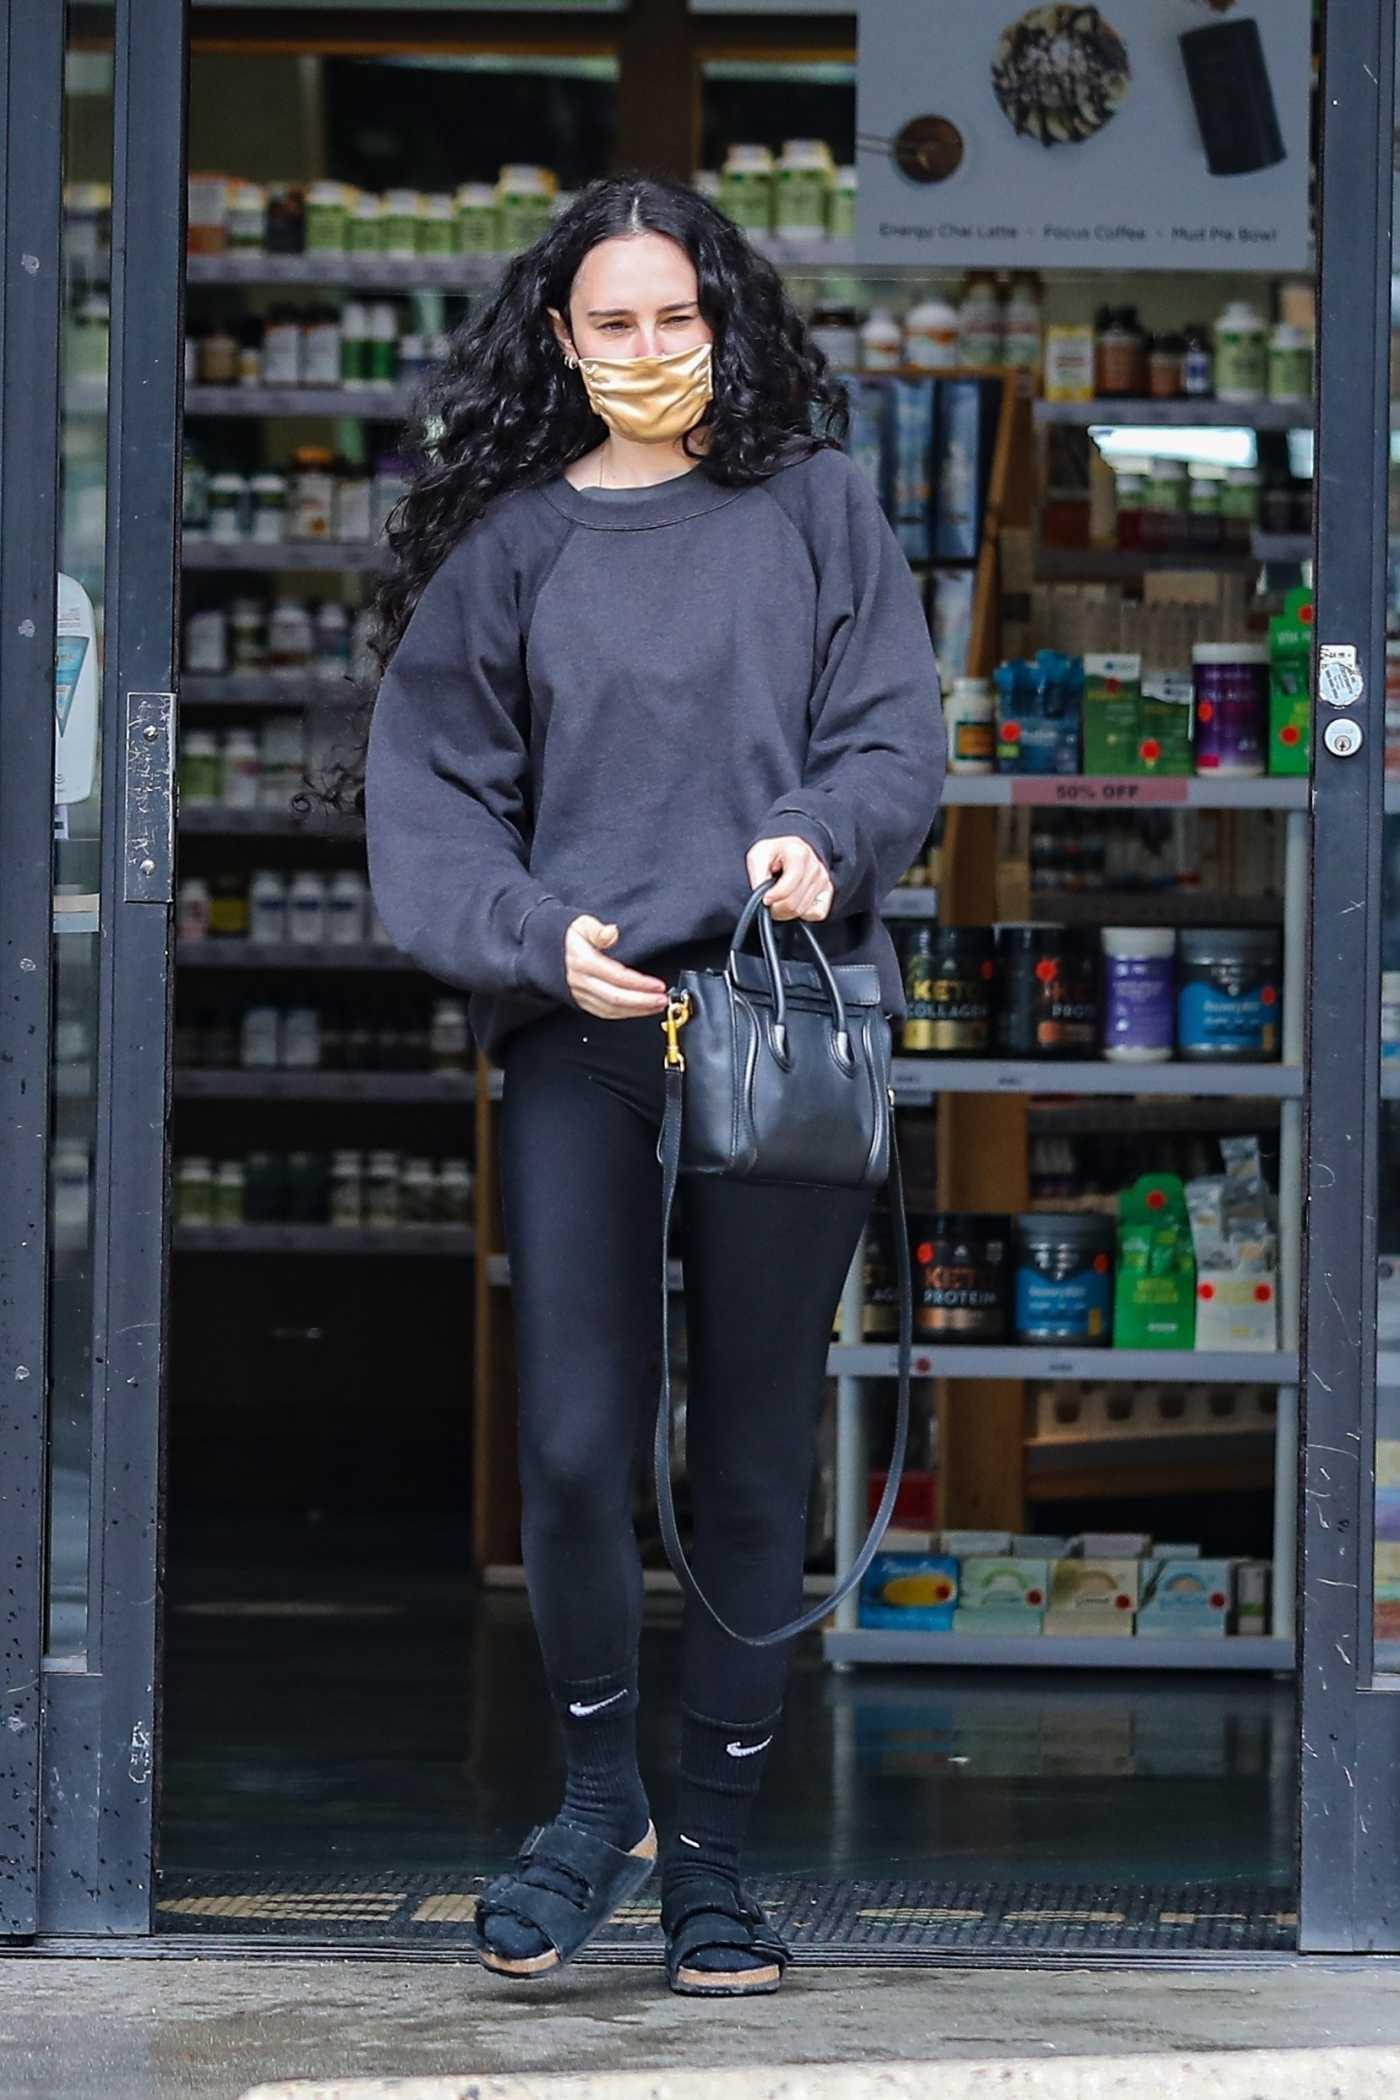 Rumer Willis in a Grey Sweatshirt Goes Shopping in West Hollywood 03/15/2021